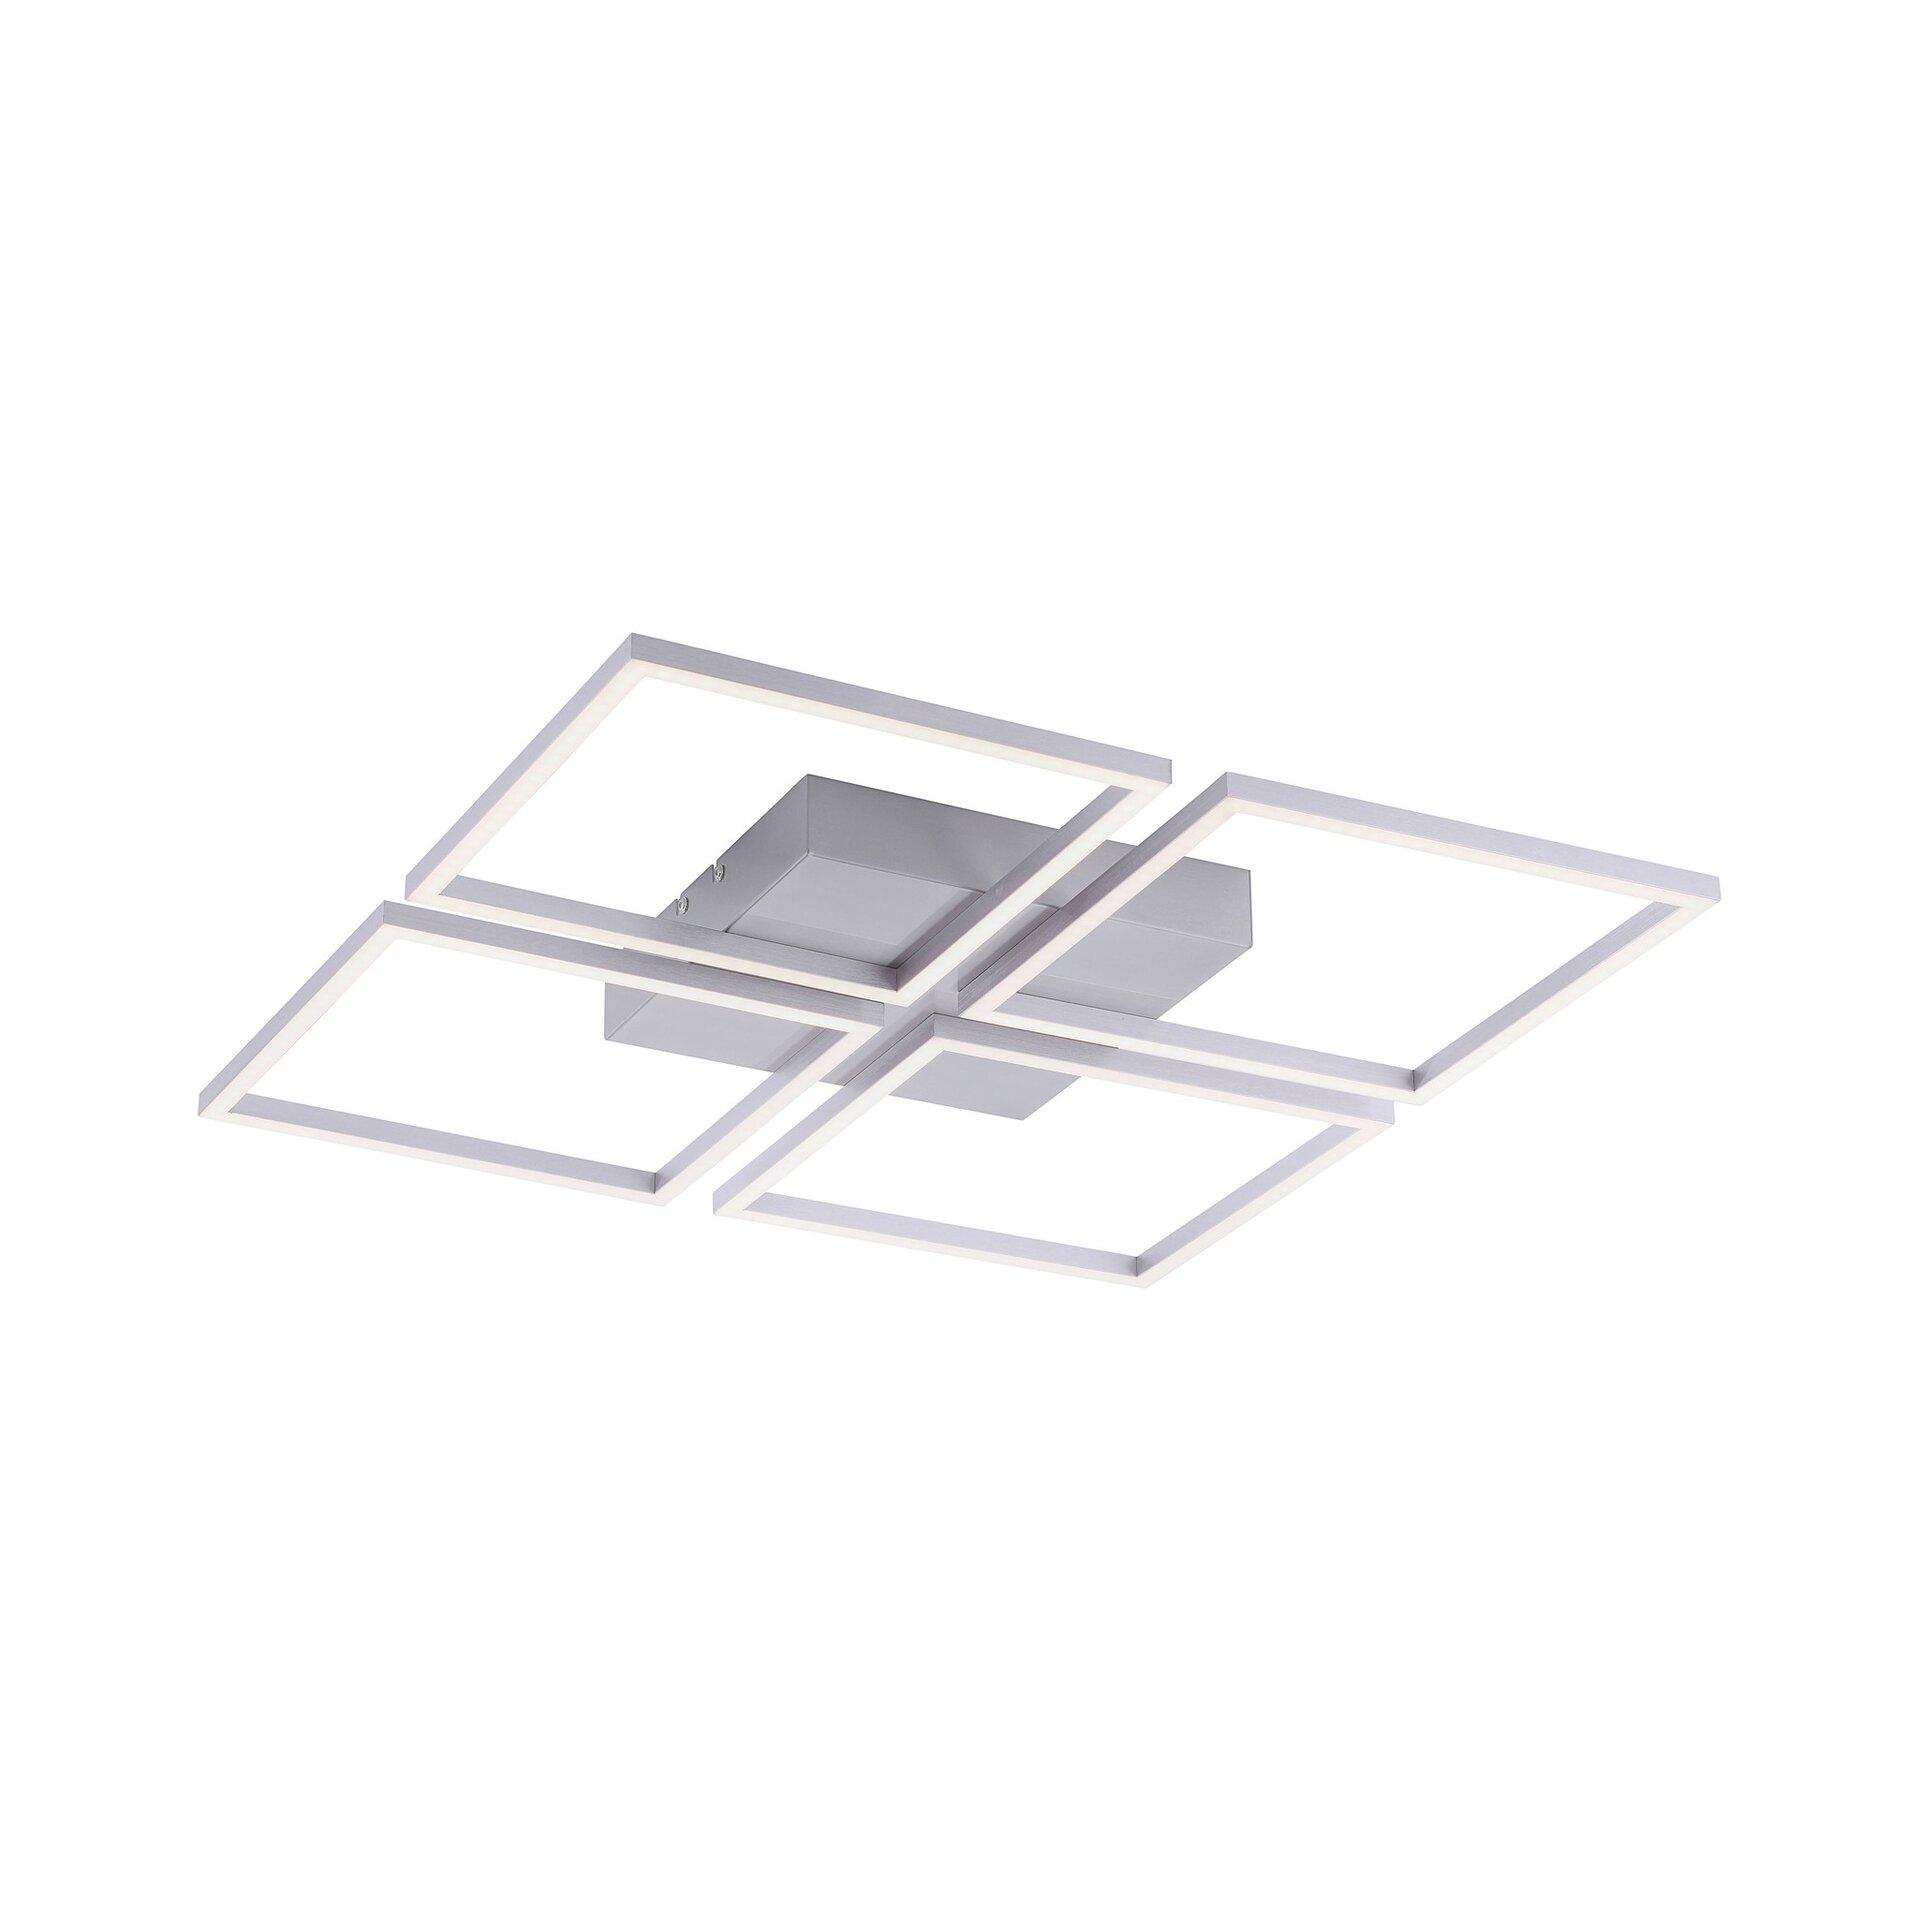 Deckenleuchte INIGO Paul Neuhaus Metall 53 x 5 x 53 cm